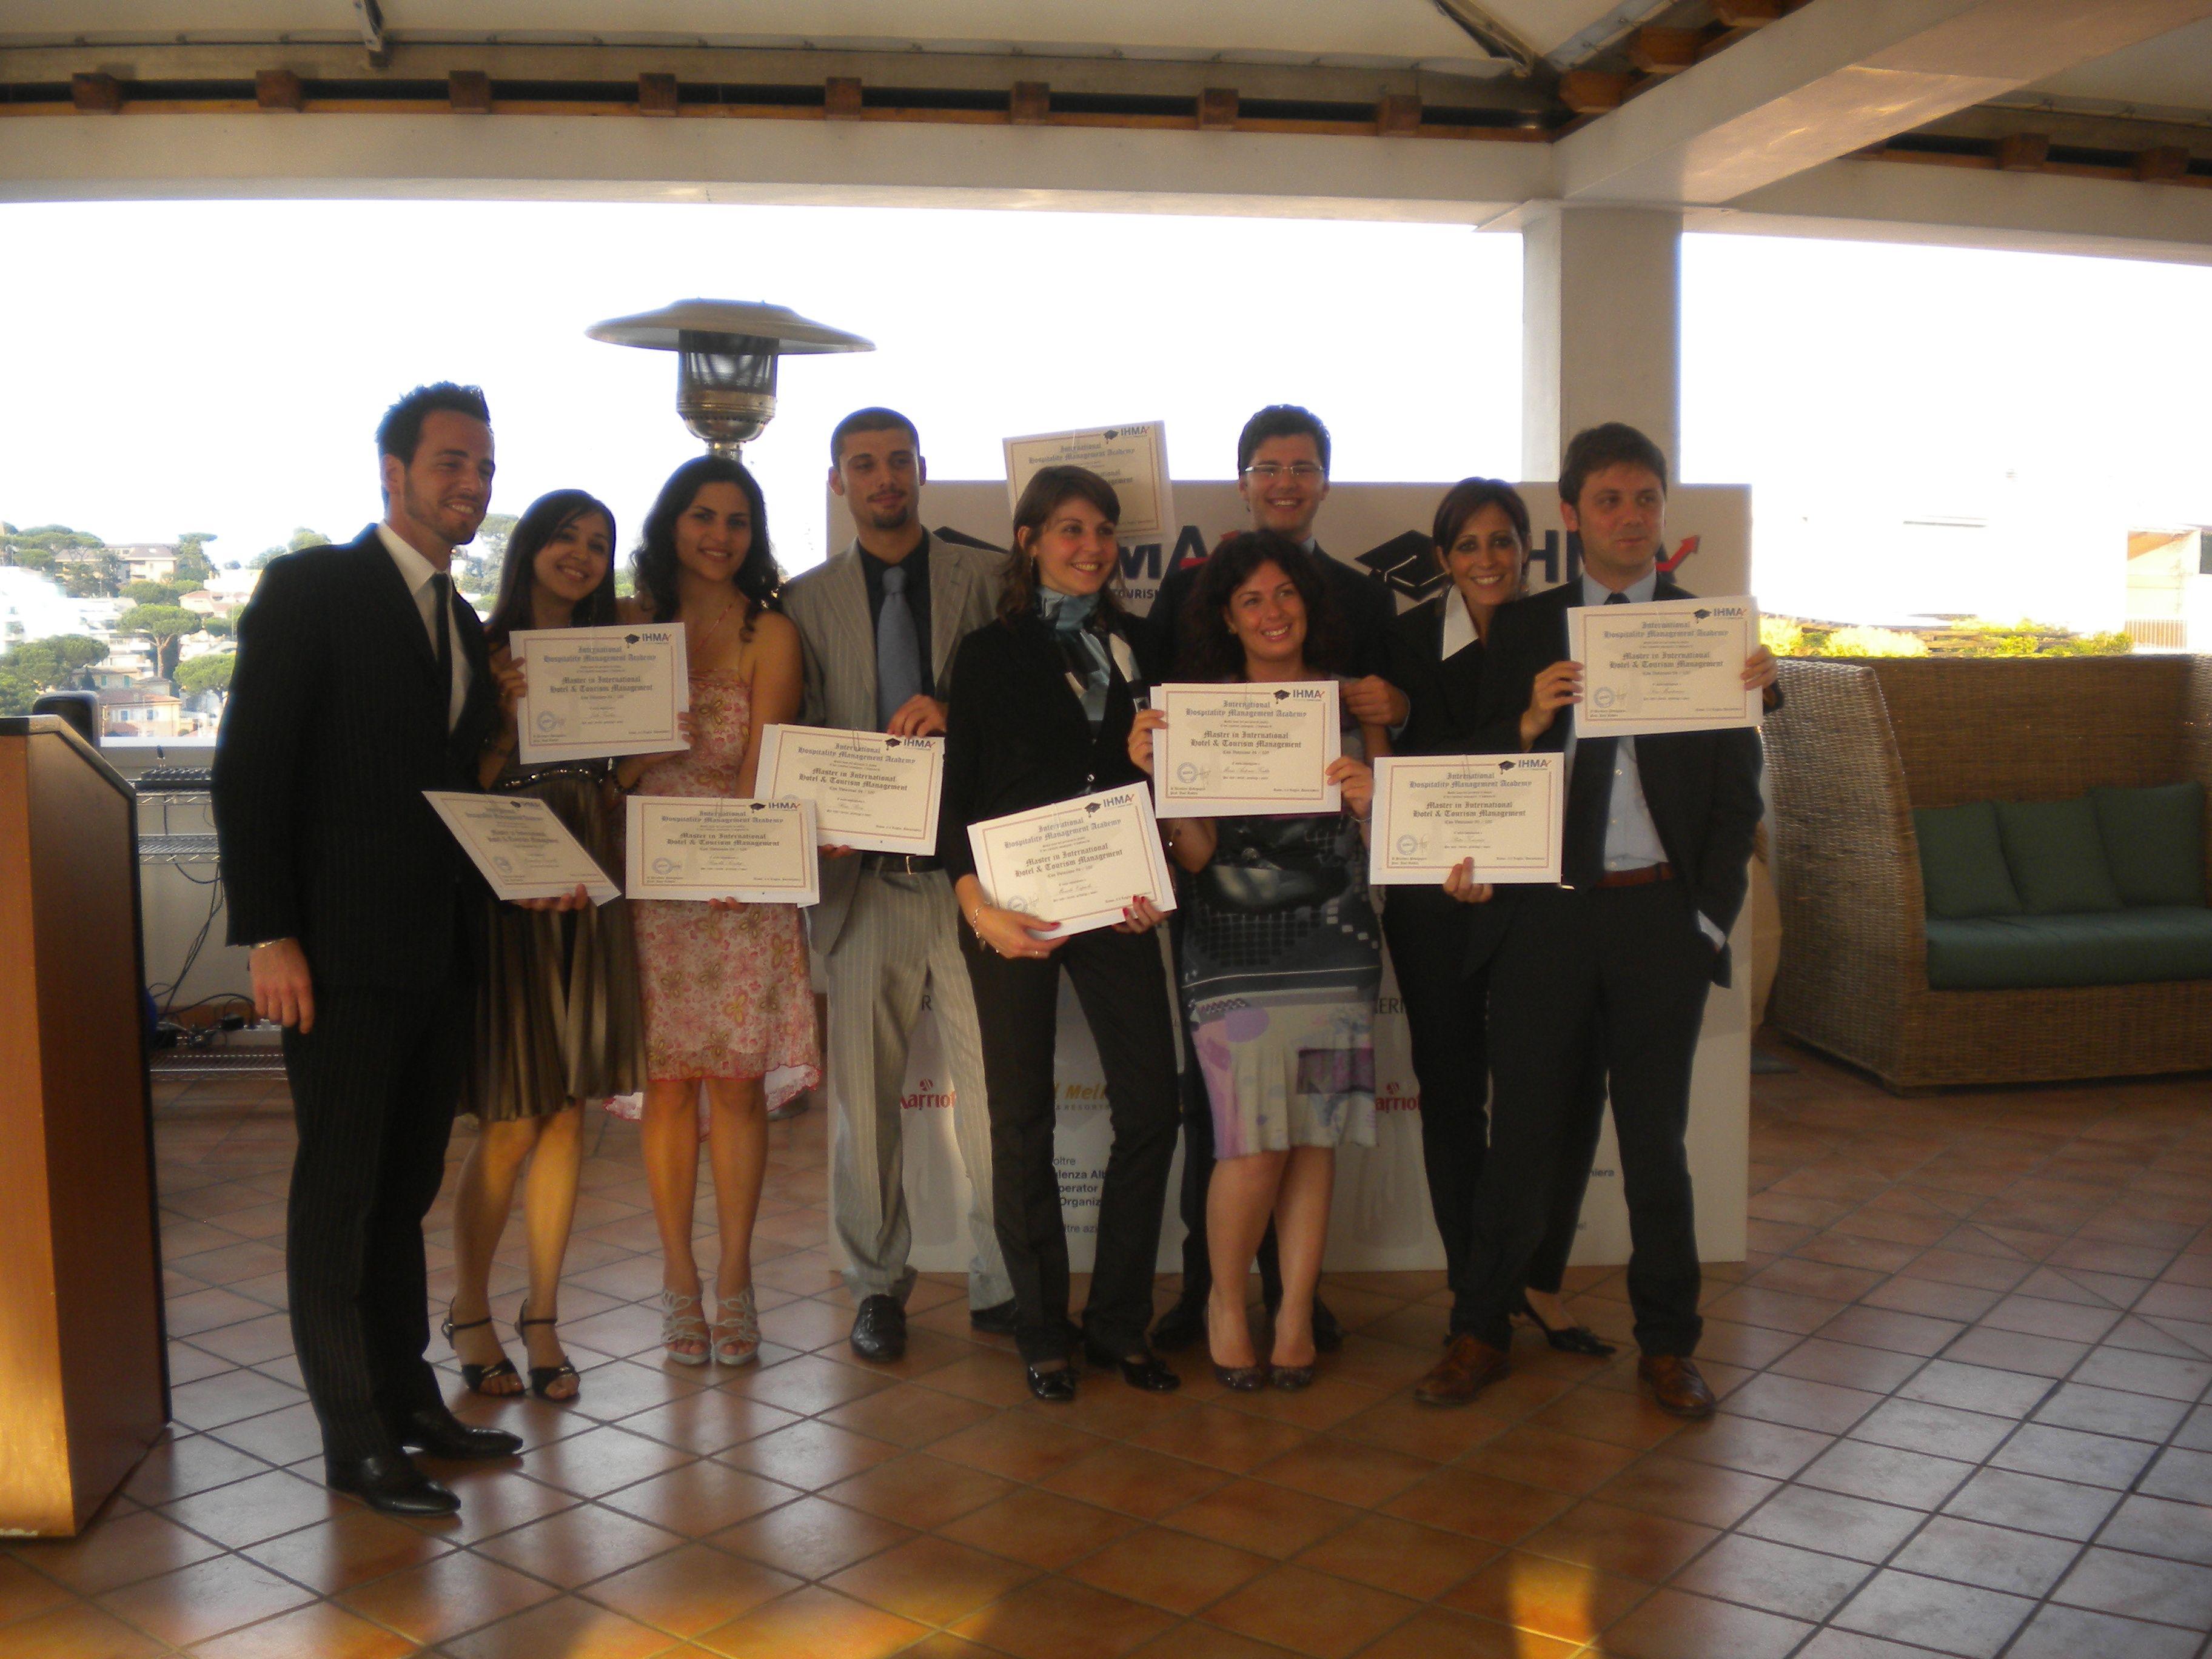 Cerimonia di consegna dei diplomi del Master in International Hotel & Tourism Management